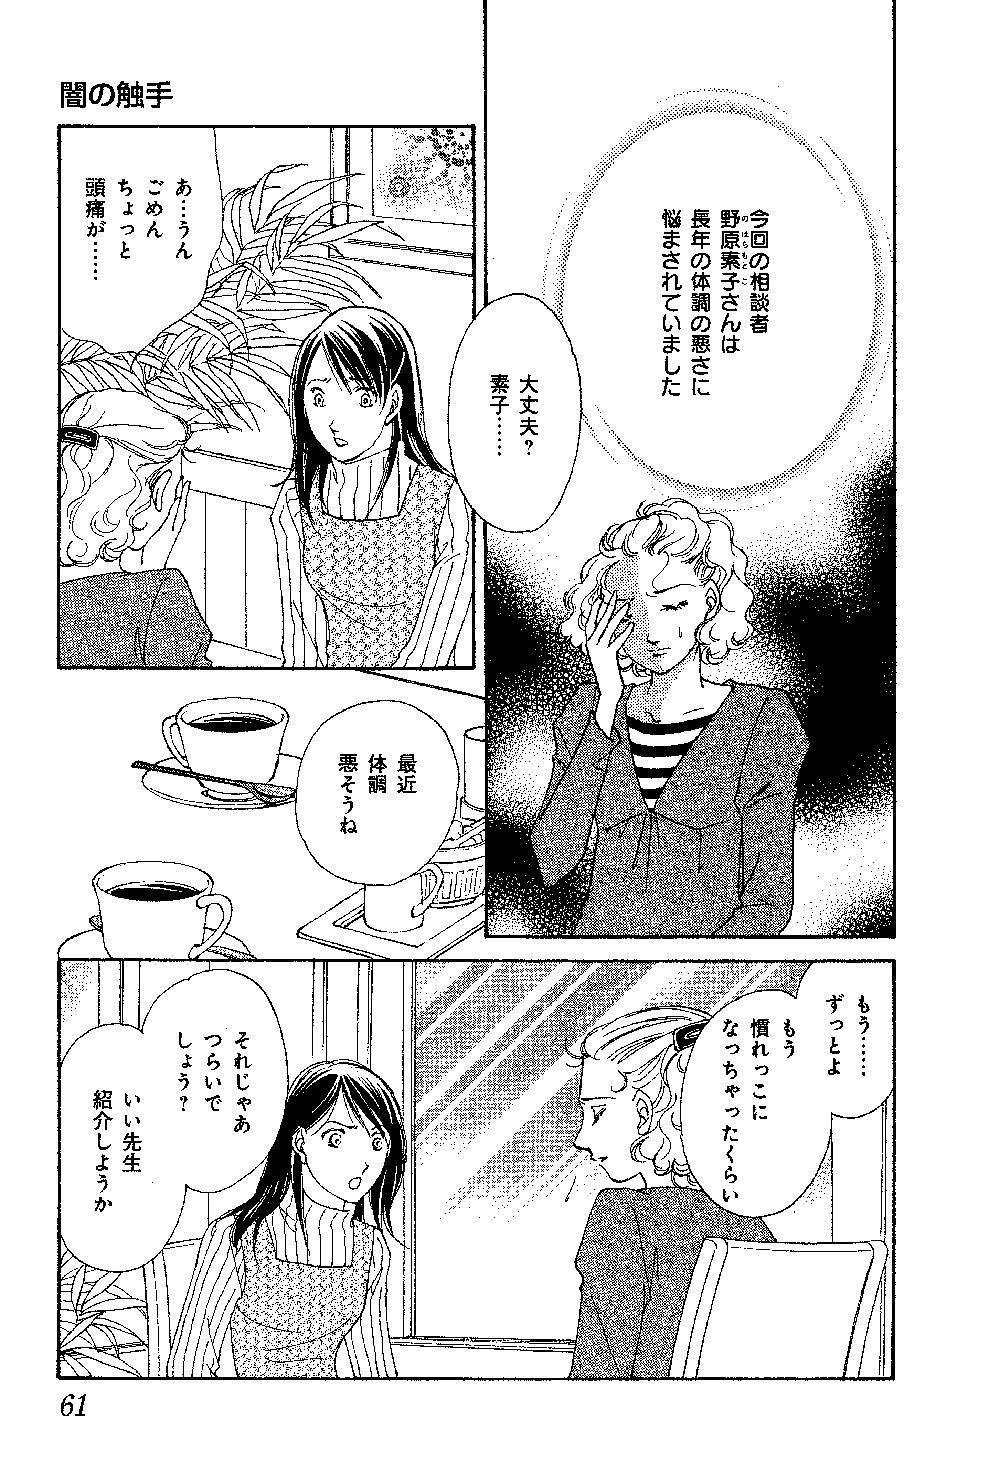 mayuri_0001_0061.jpg